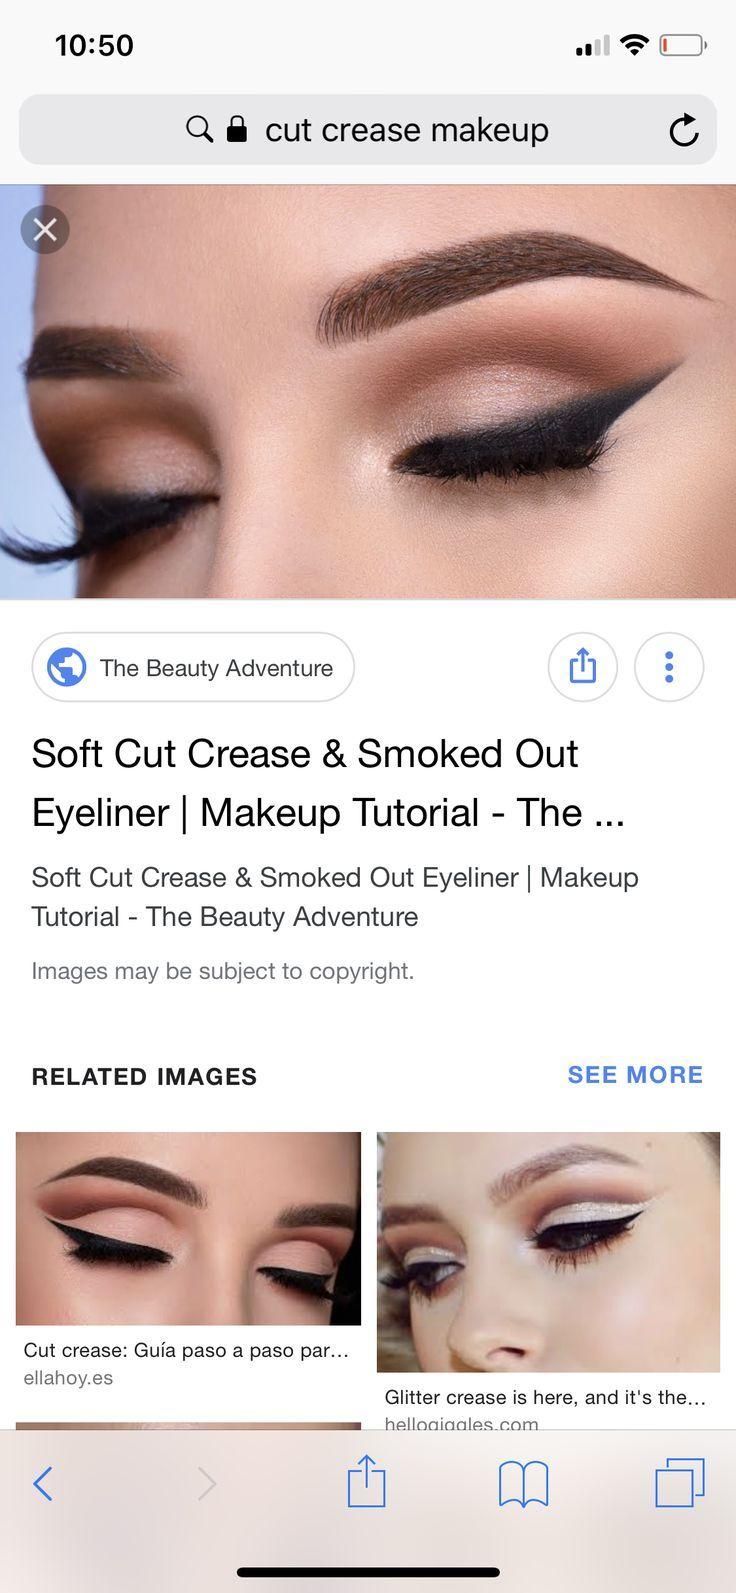 makeup tips  Makeup tips, Beauty hacks, Beauty tips for hair